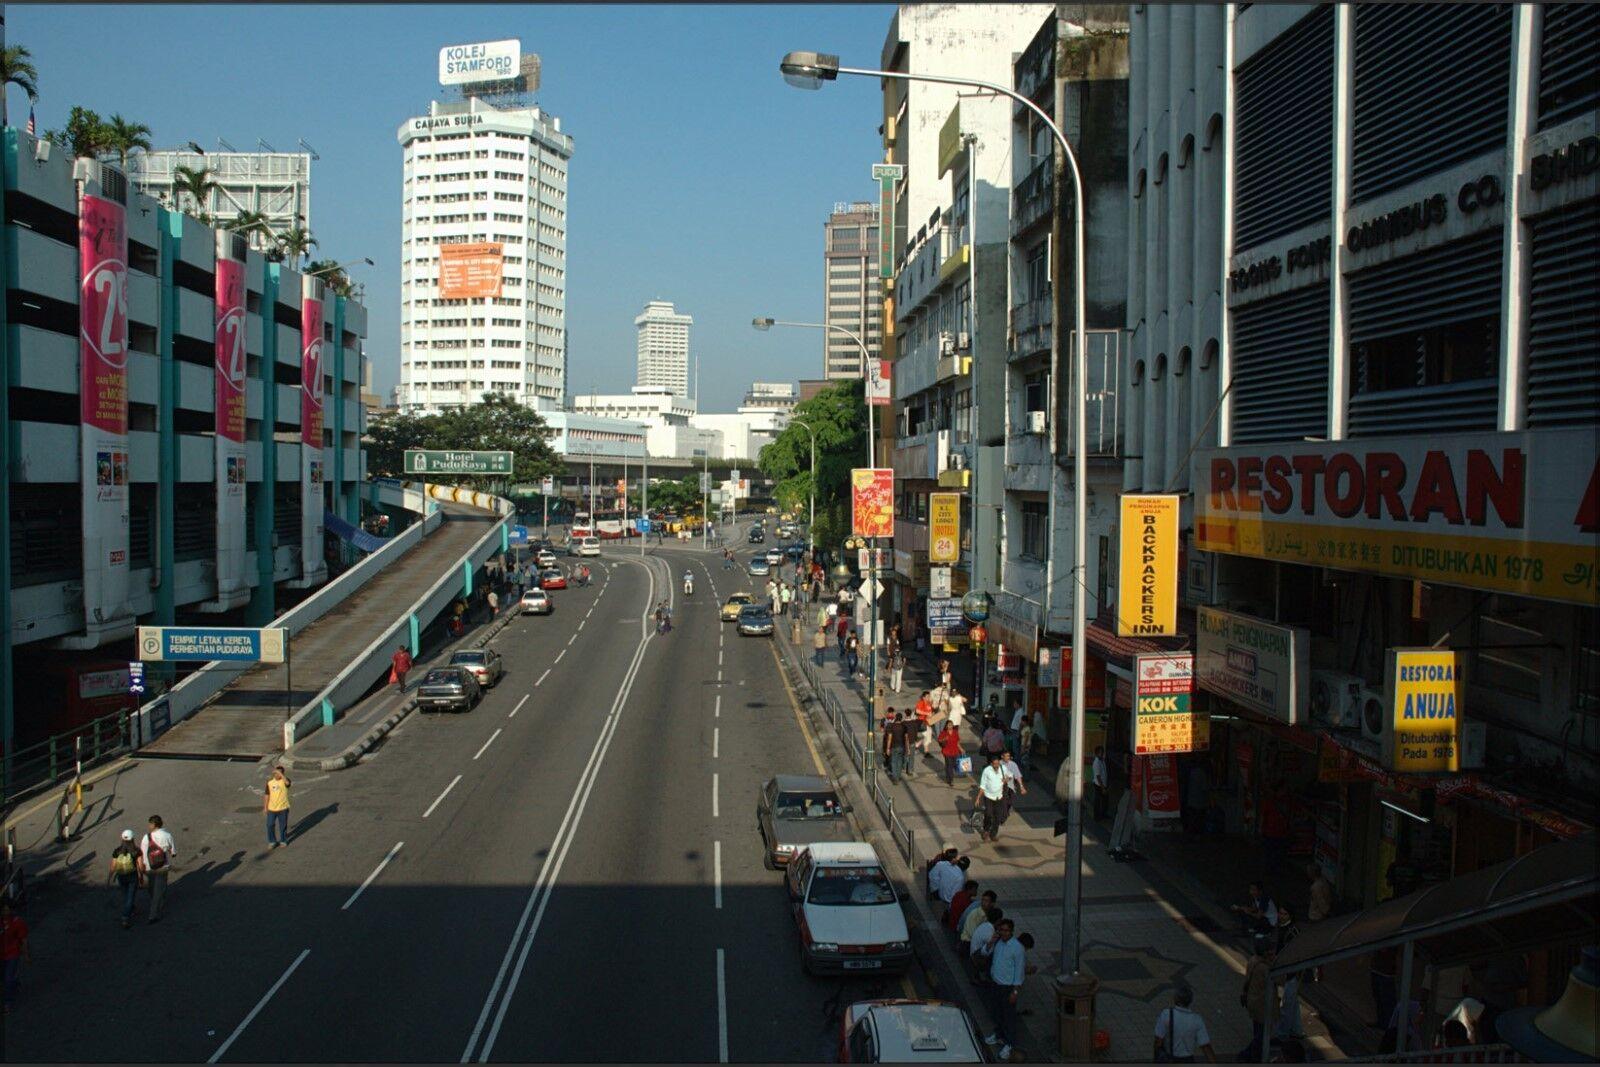 Plakat, Viele Größen; Jalan Pudu 20070218 003